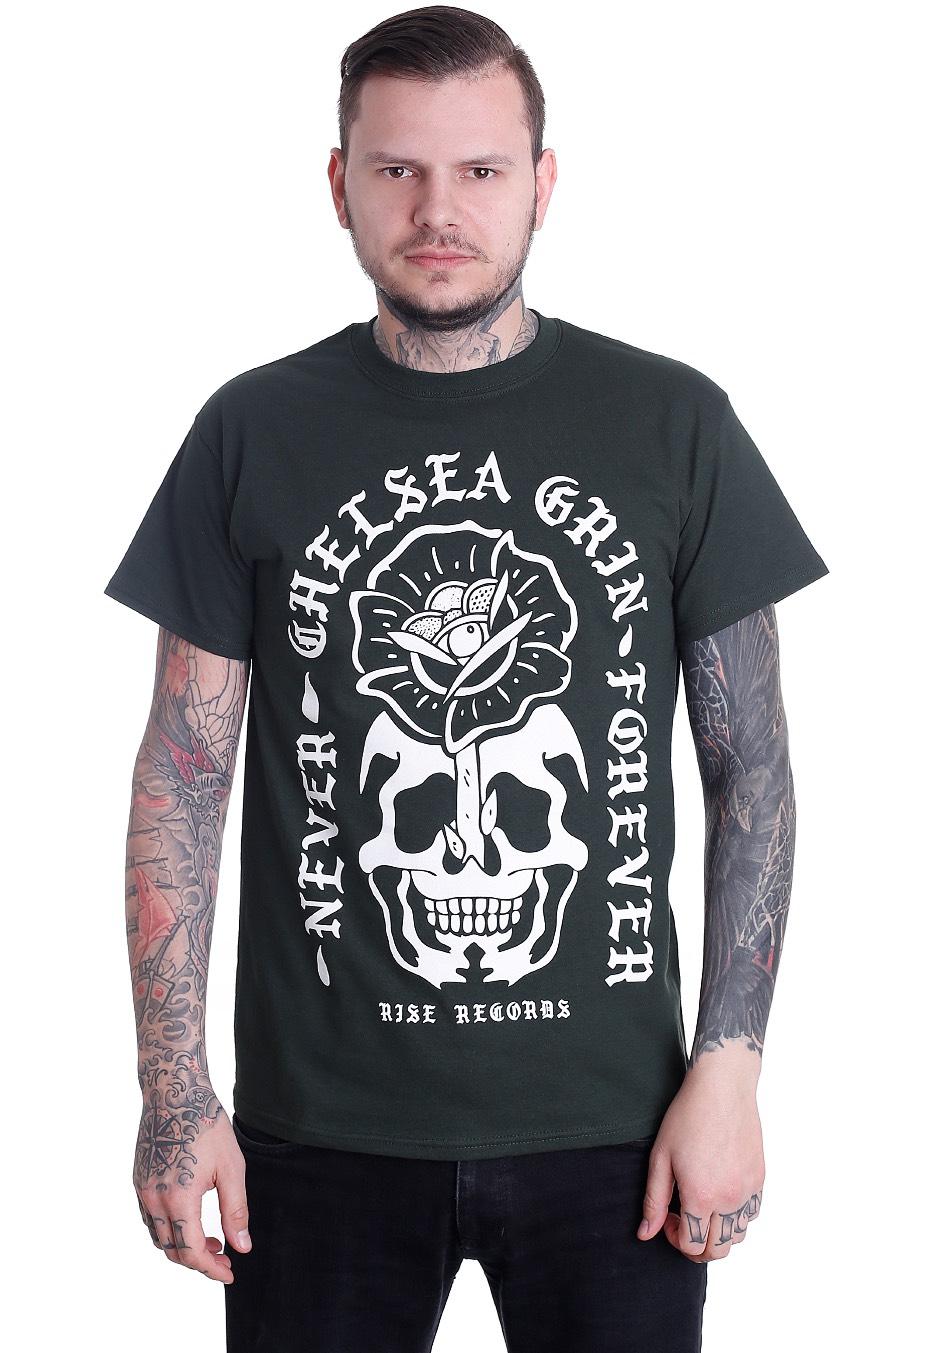 chelsea grin never forever forest green t shirt official metalcore merchandise shop. Black Bedroom Furniture Sets. Home Design Ideas